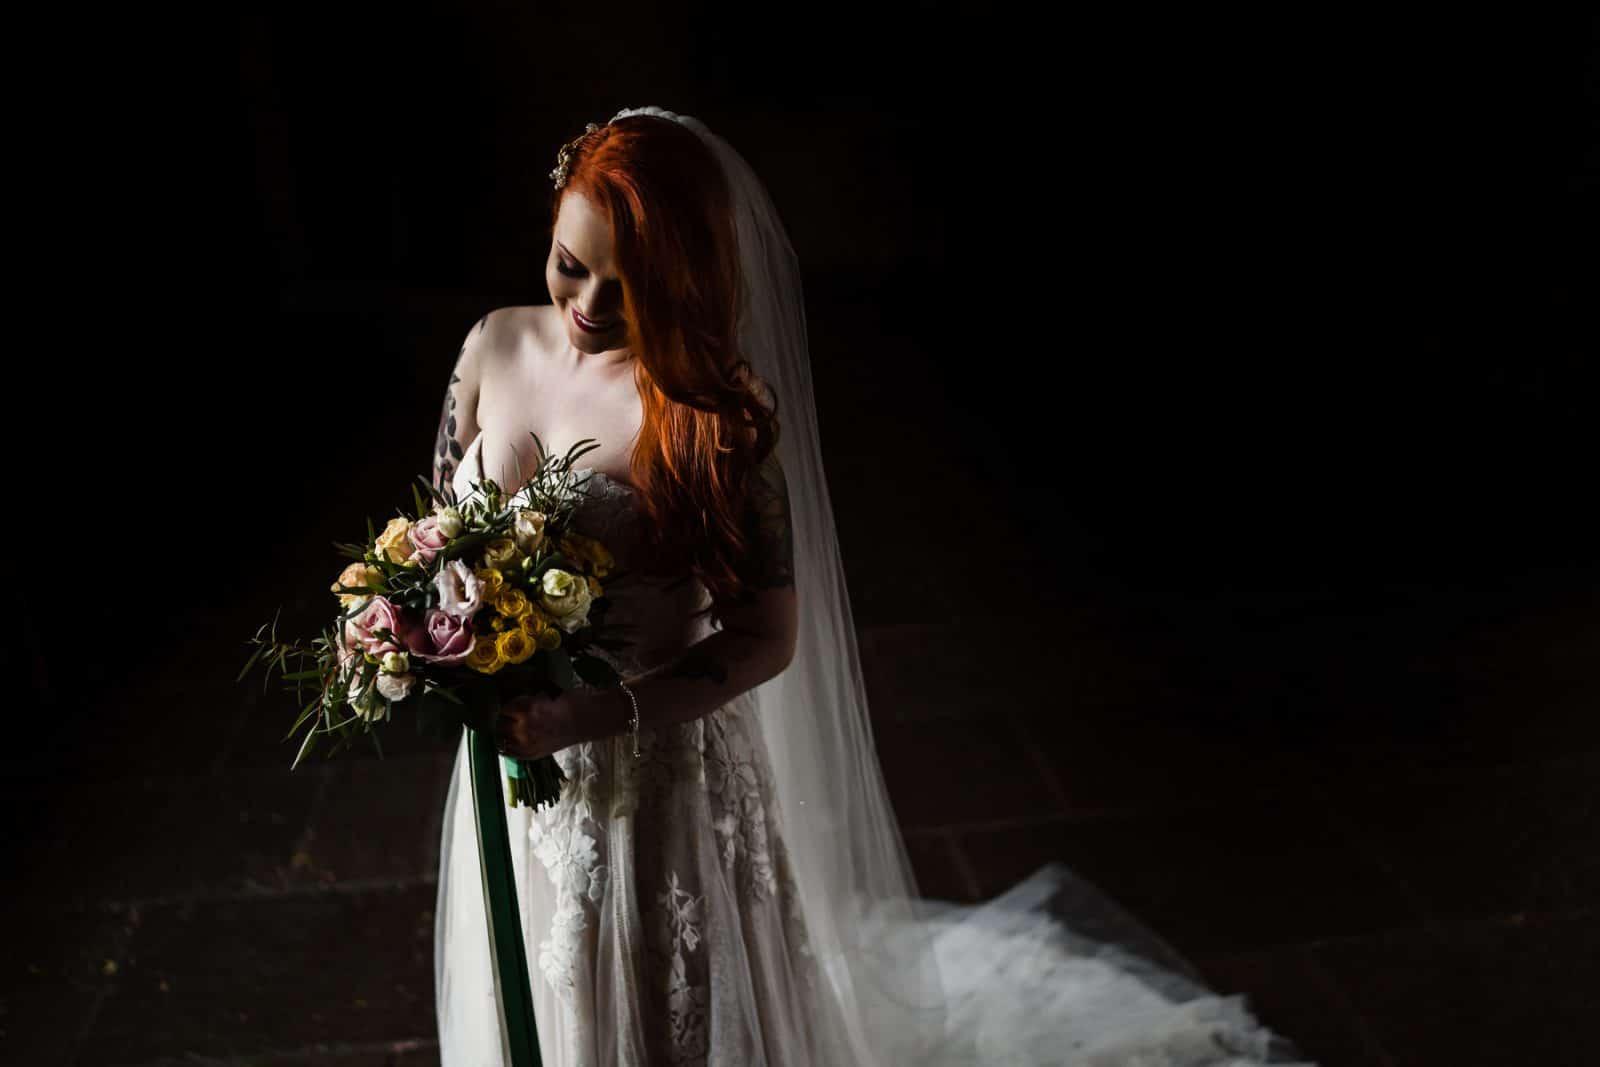 Beautiful bridal portrait of alternative bride with tattoos